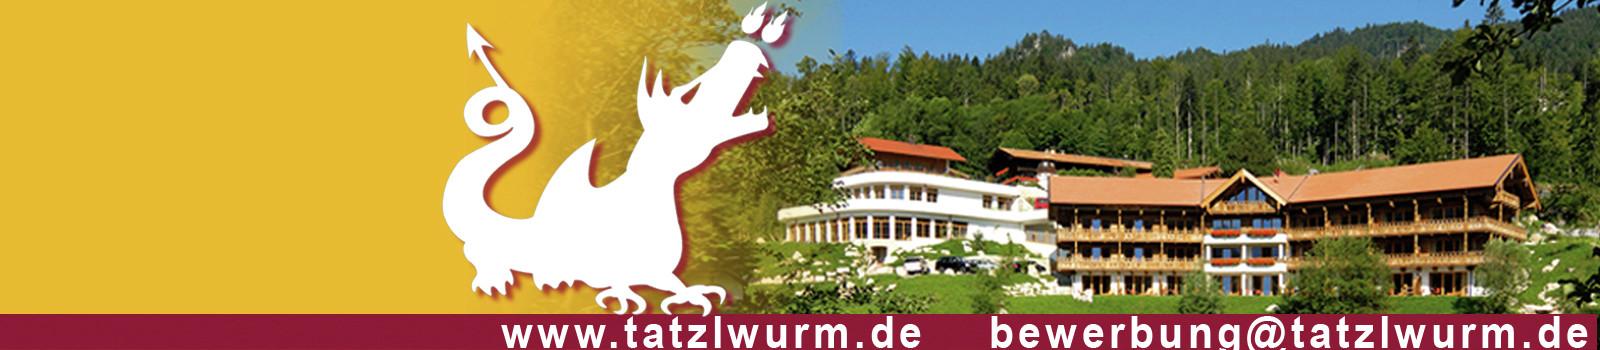 Feuriger Tatzlwurm Hotelresort & Spa